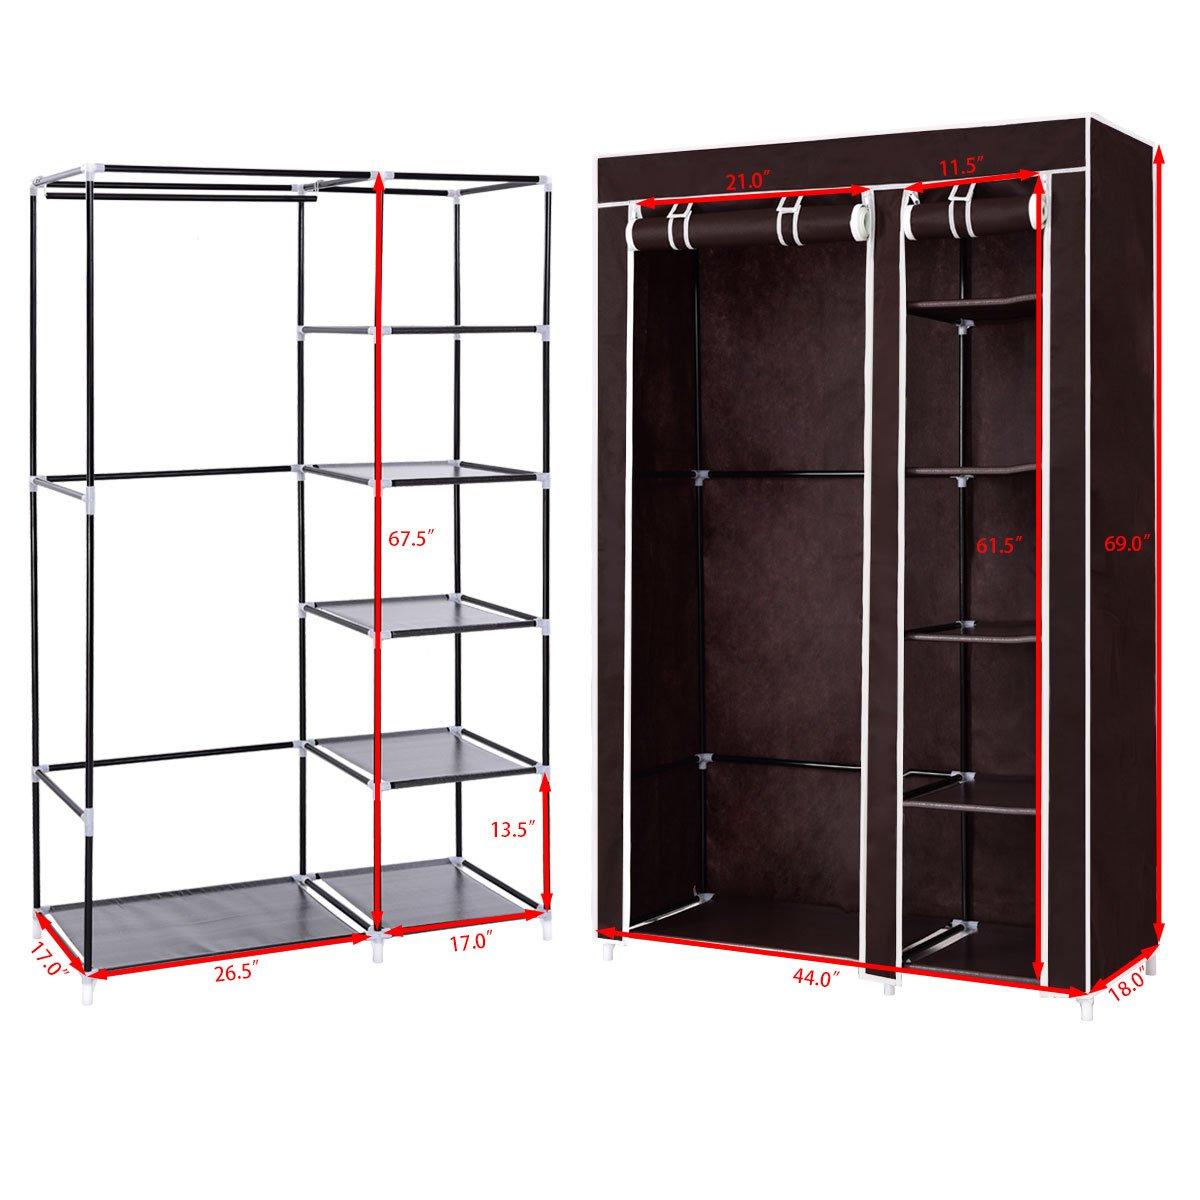 Amazon.com: Organizador portátil tanto para ropa como ...